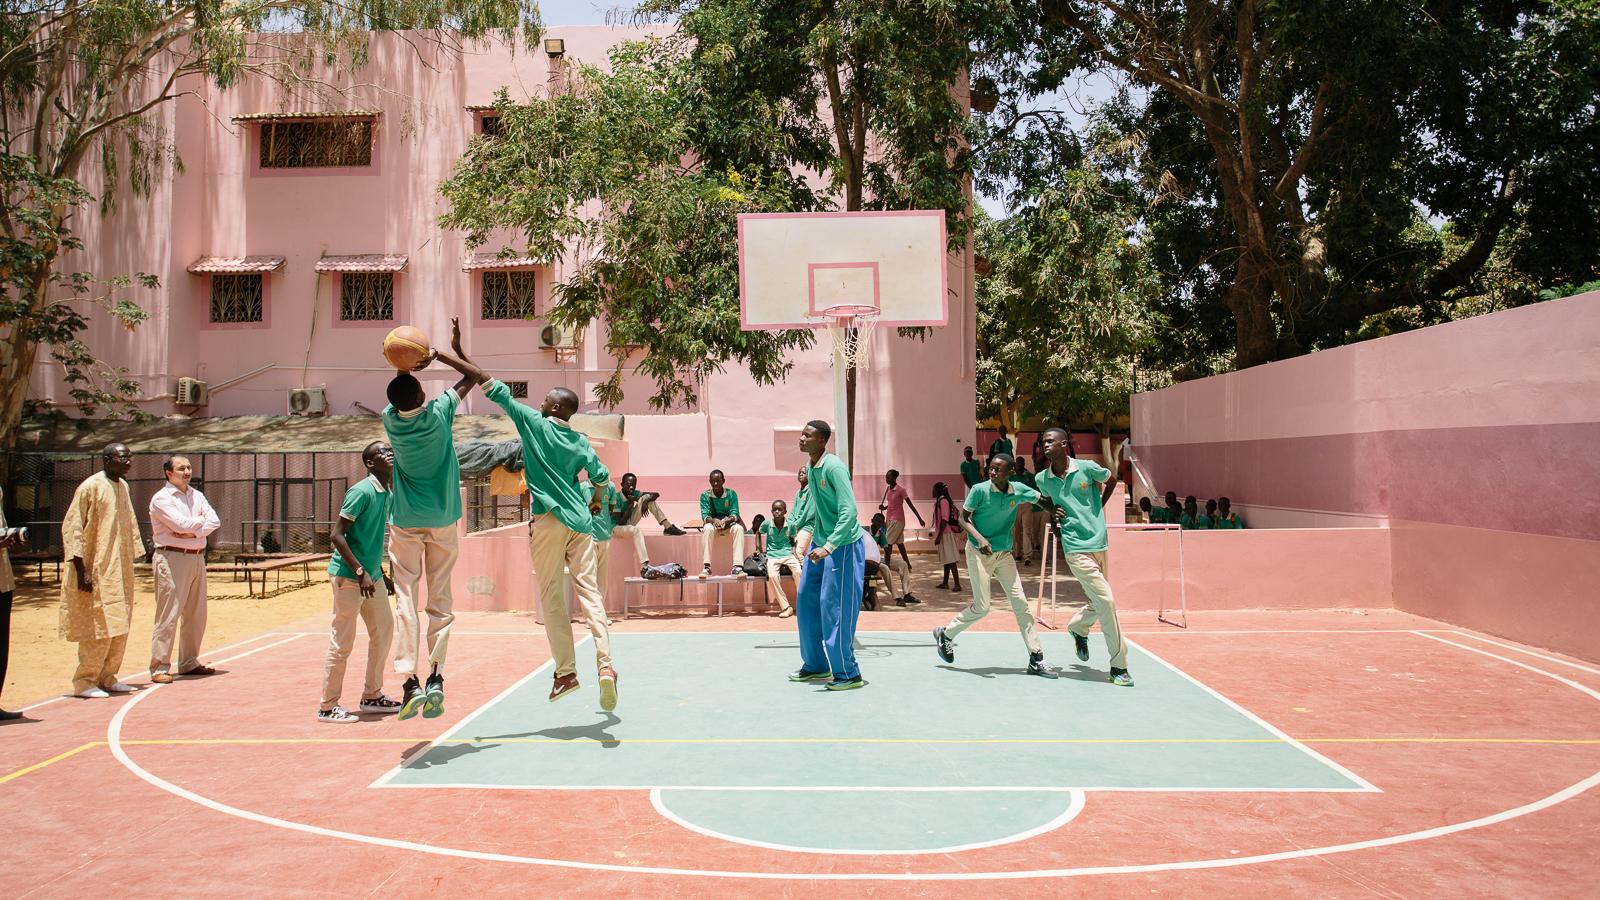 0009_20150529_Yavuz Selim School_thiès_Senegal©KevinCouliau.jpg